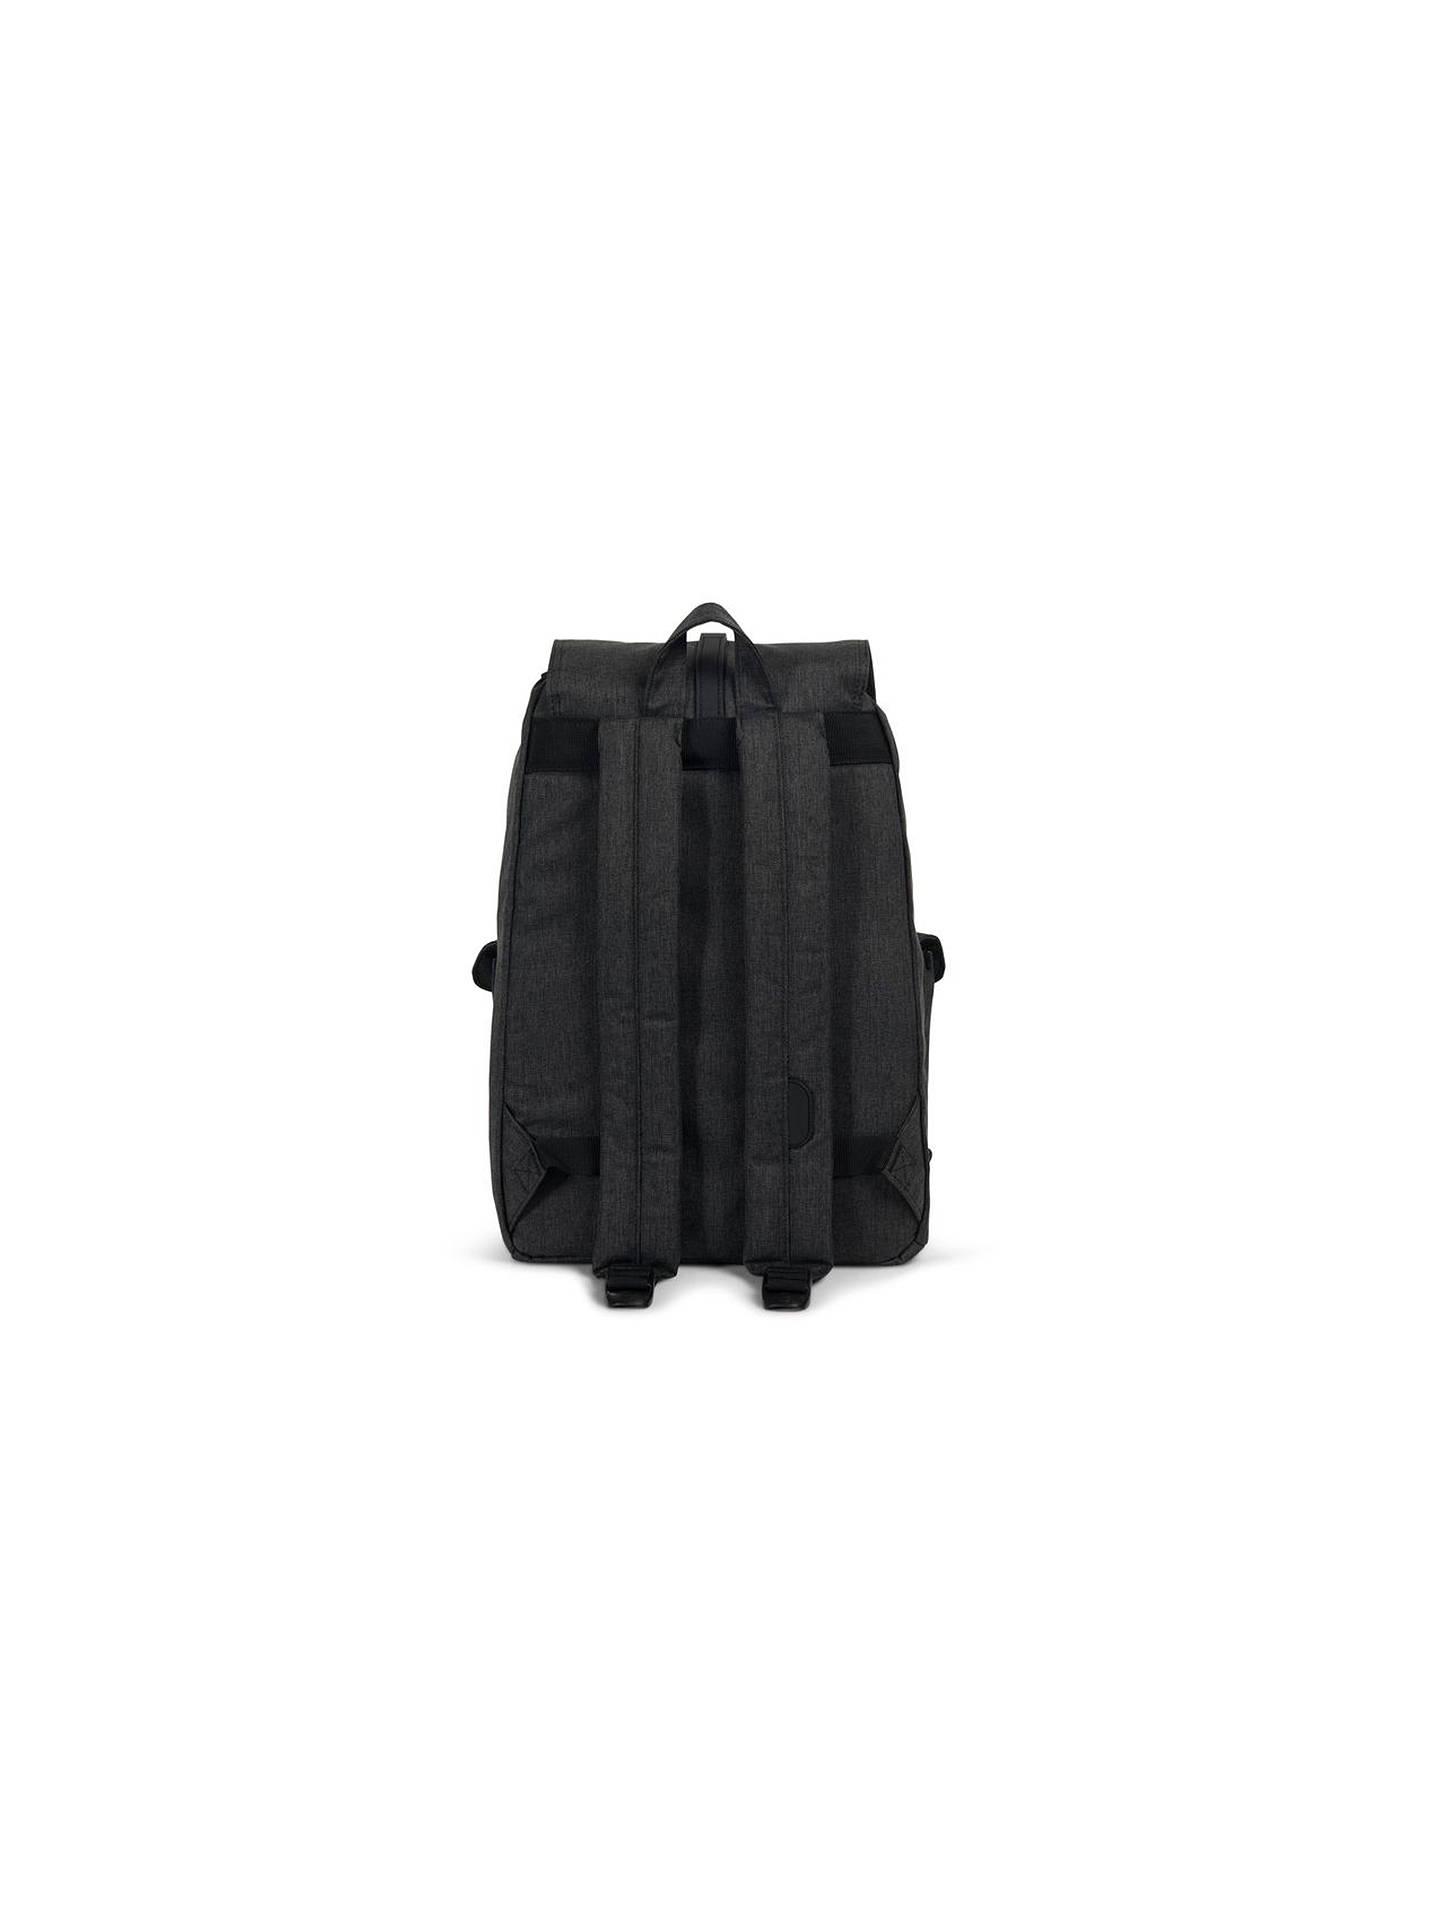 e391845e60 ... Buy Herschel Supply Co. Dawson Backpack